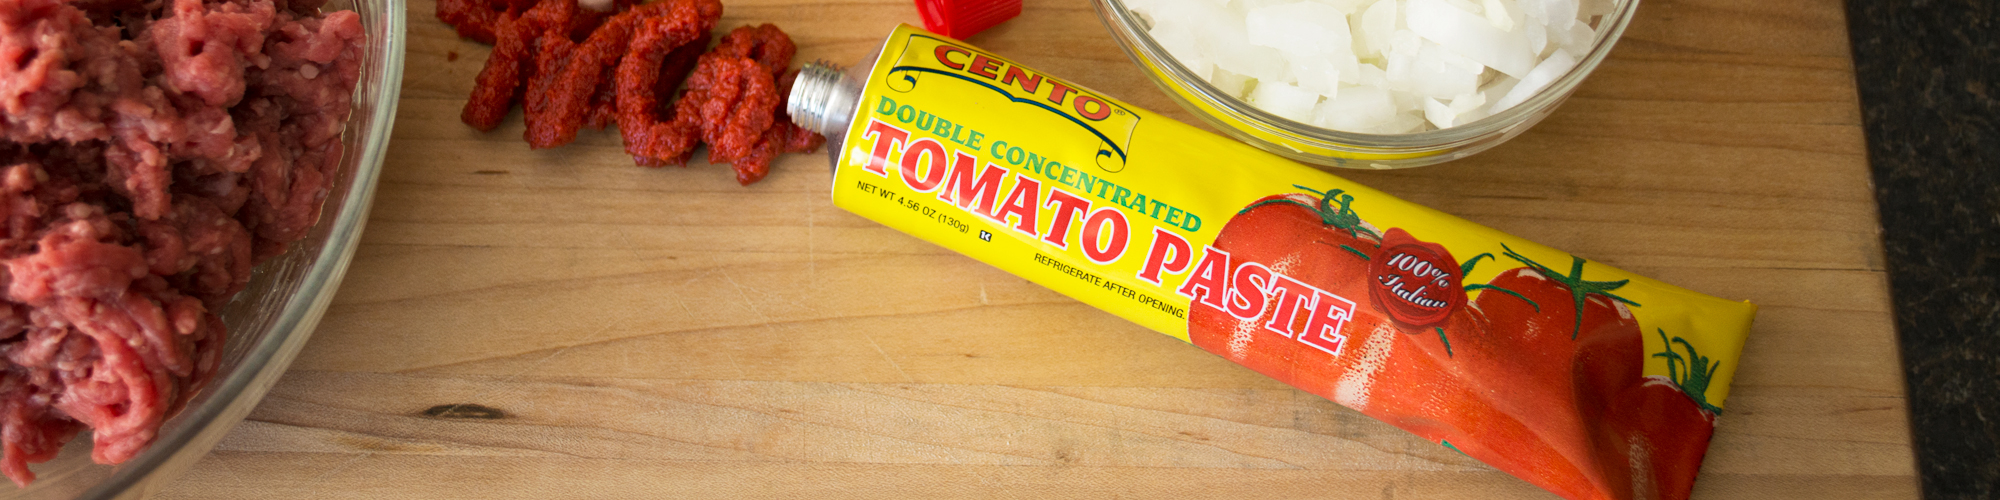 Tomato Paste In A Tube